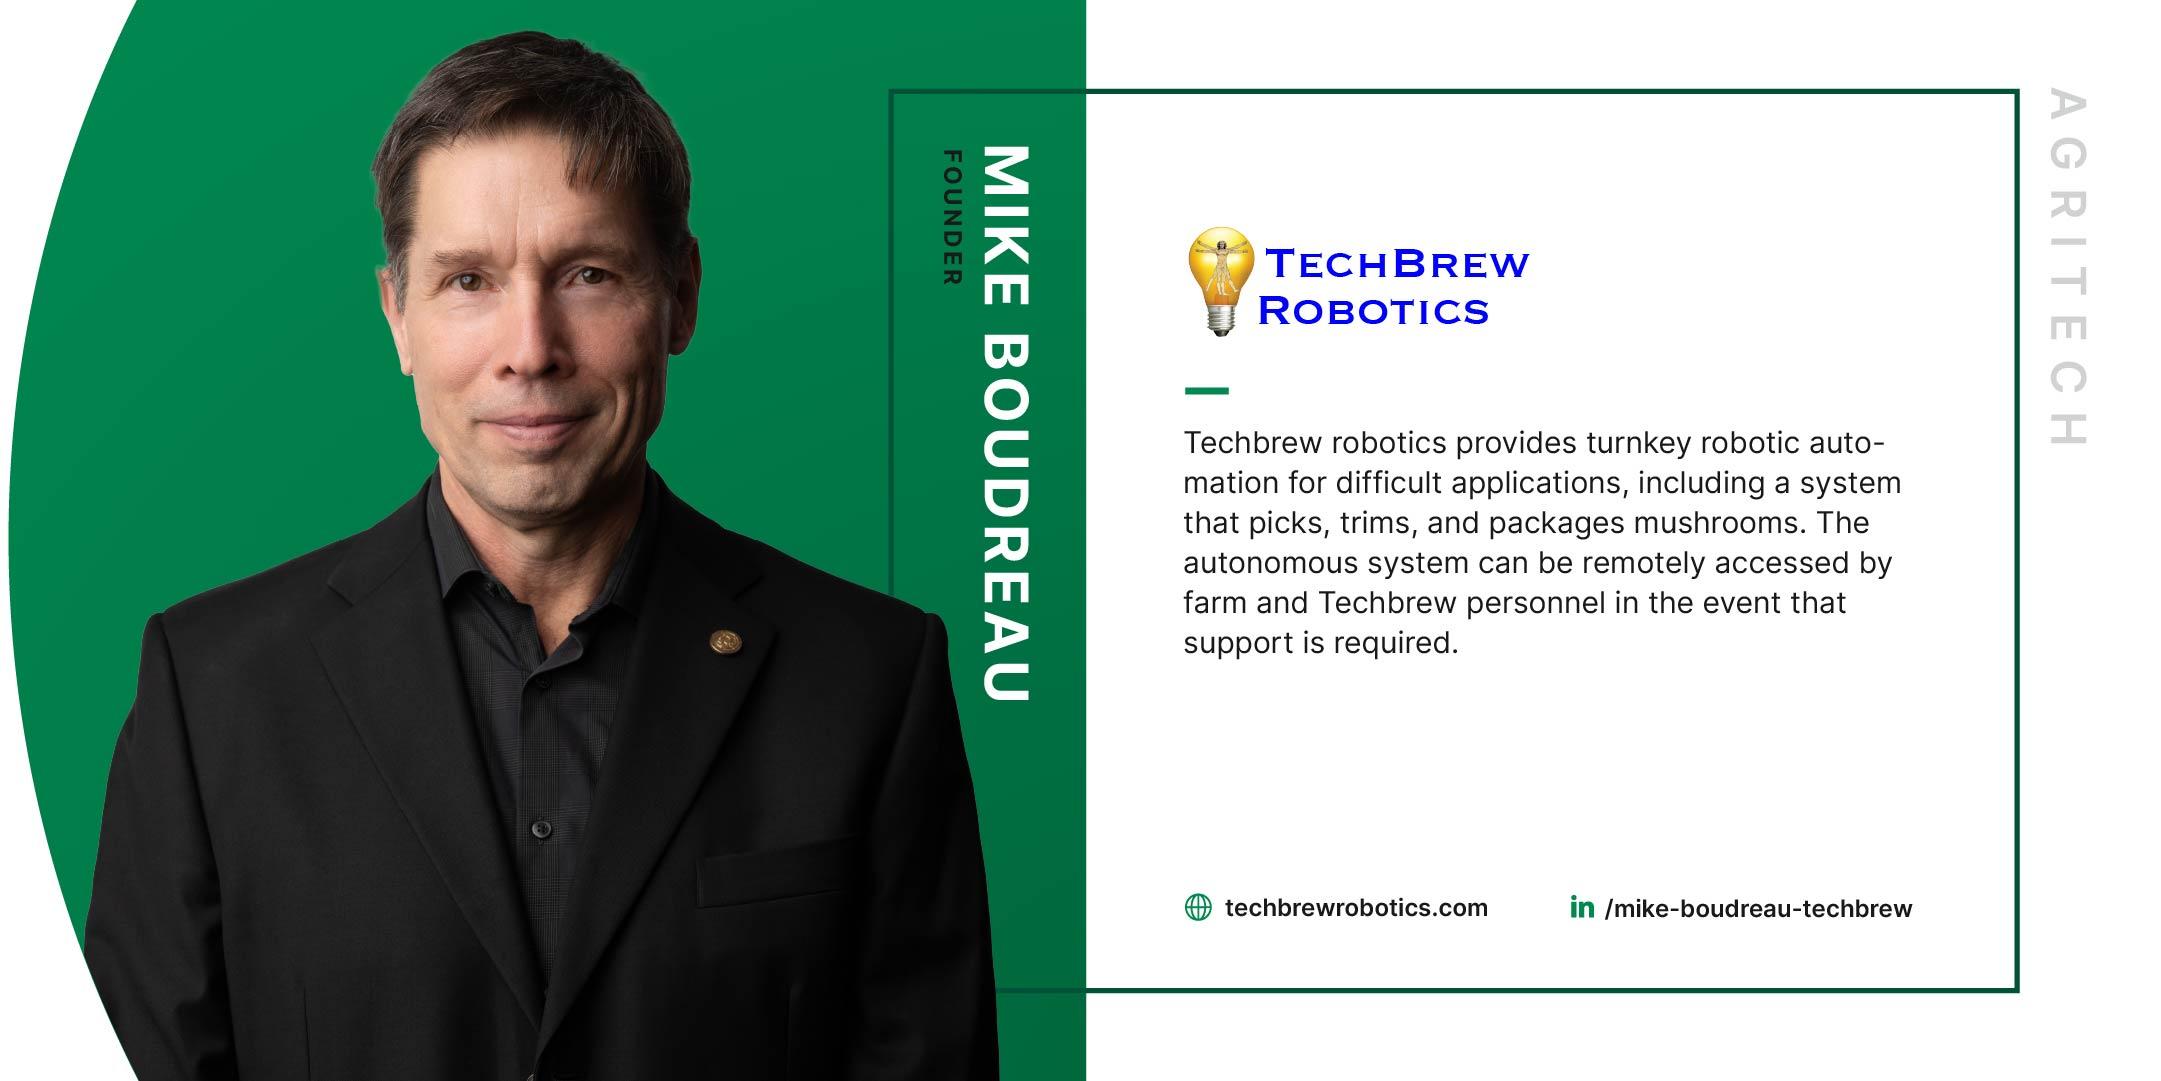 BlogAsset_2021AngelSummit_Techbrew Robotics - Mike Boudreau.jpg